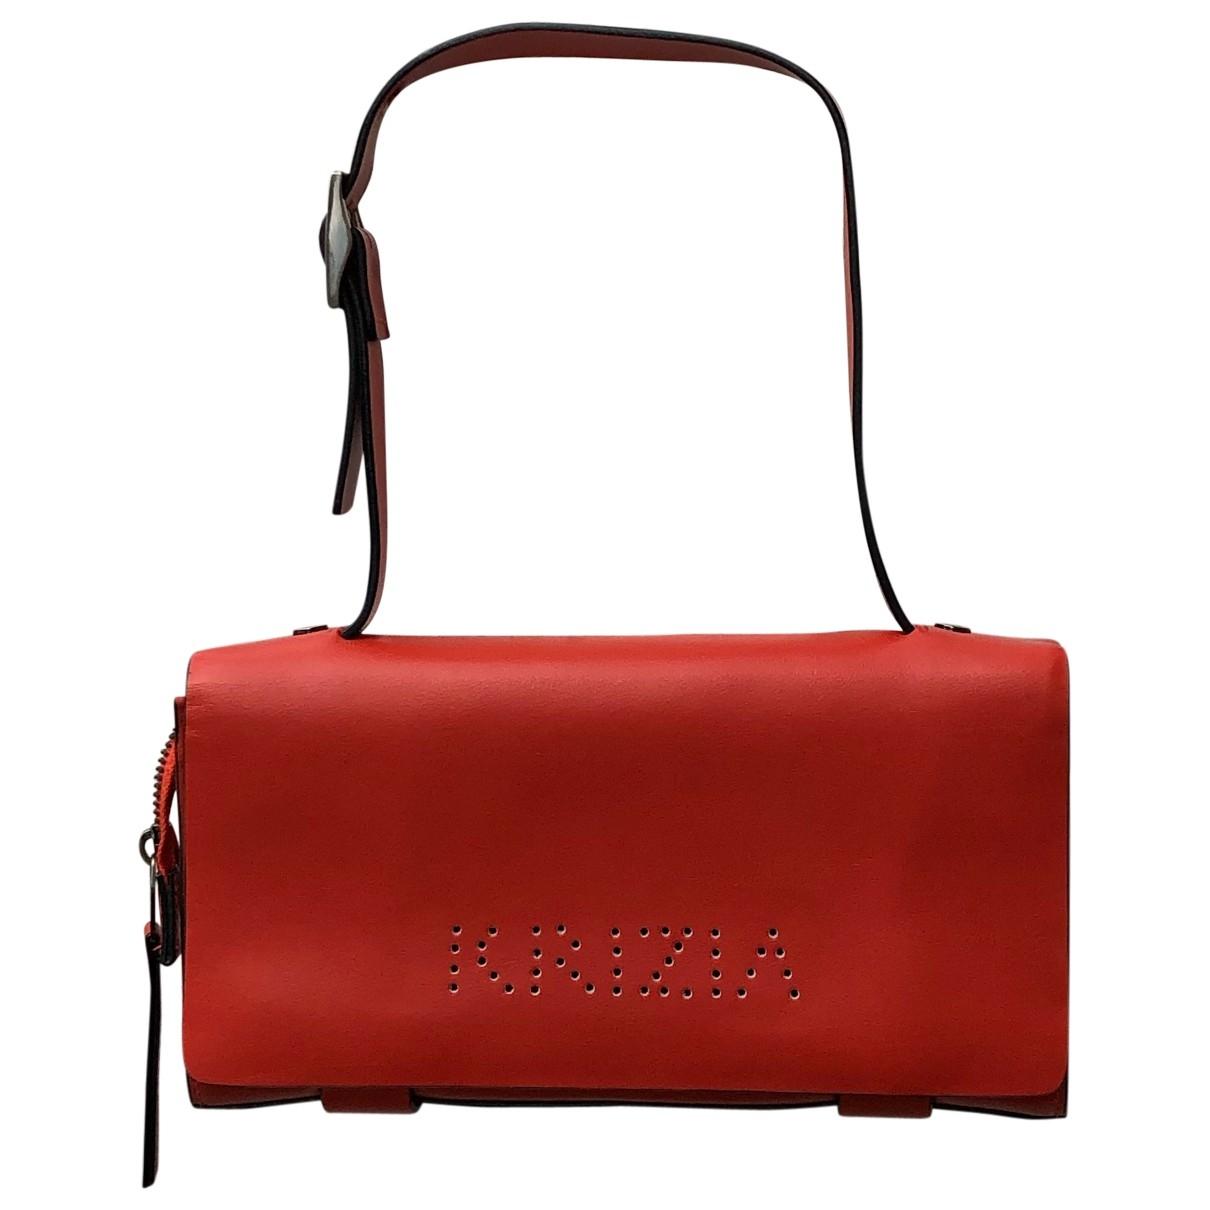 Krizia \N Red Leather handbag for Women \N